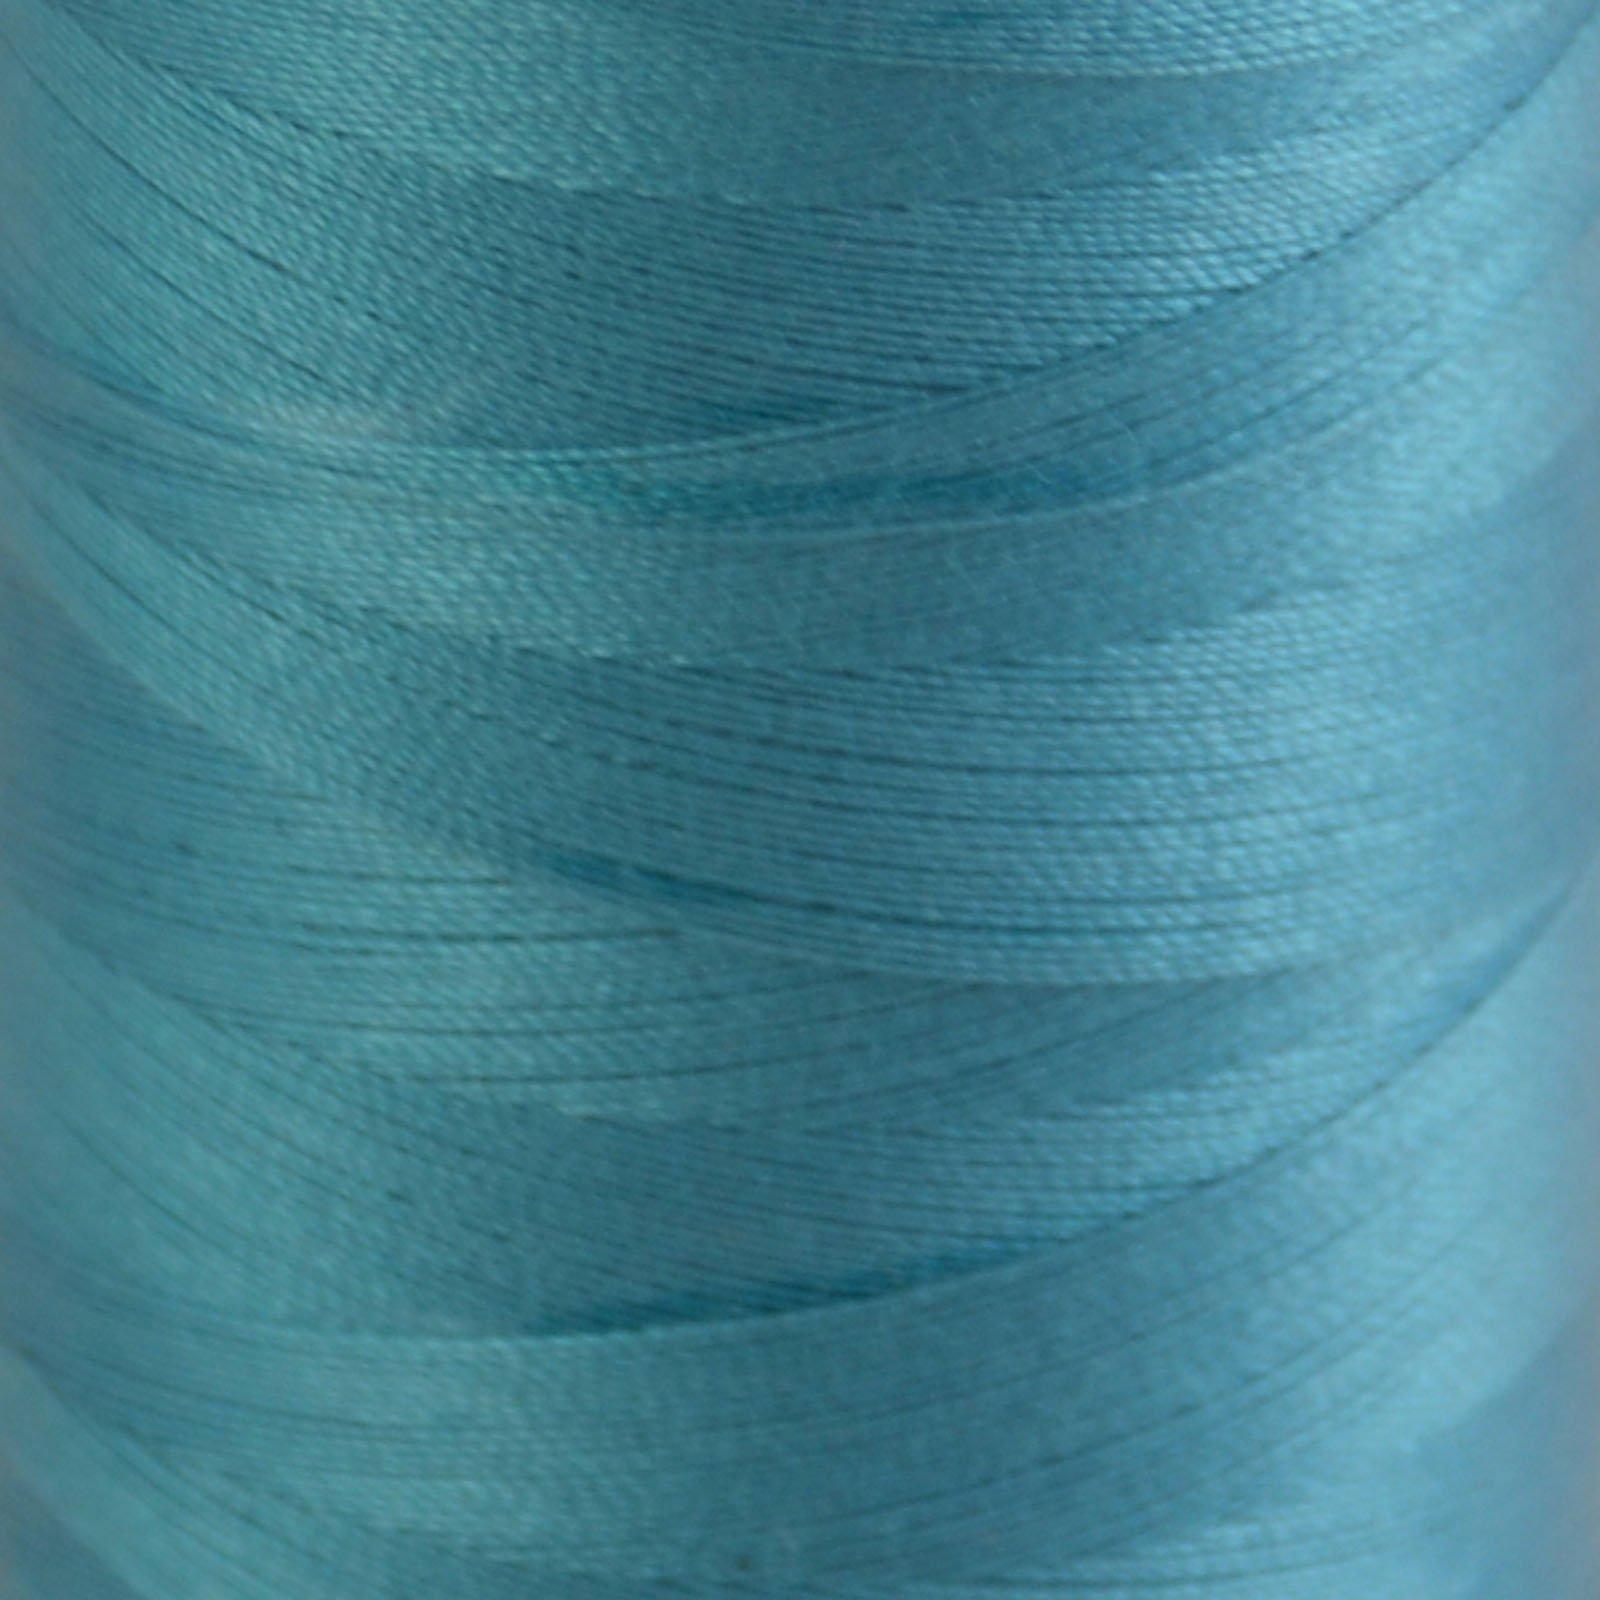 # 5005 Bright Turquoise